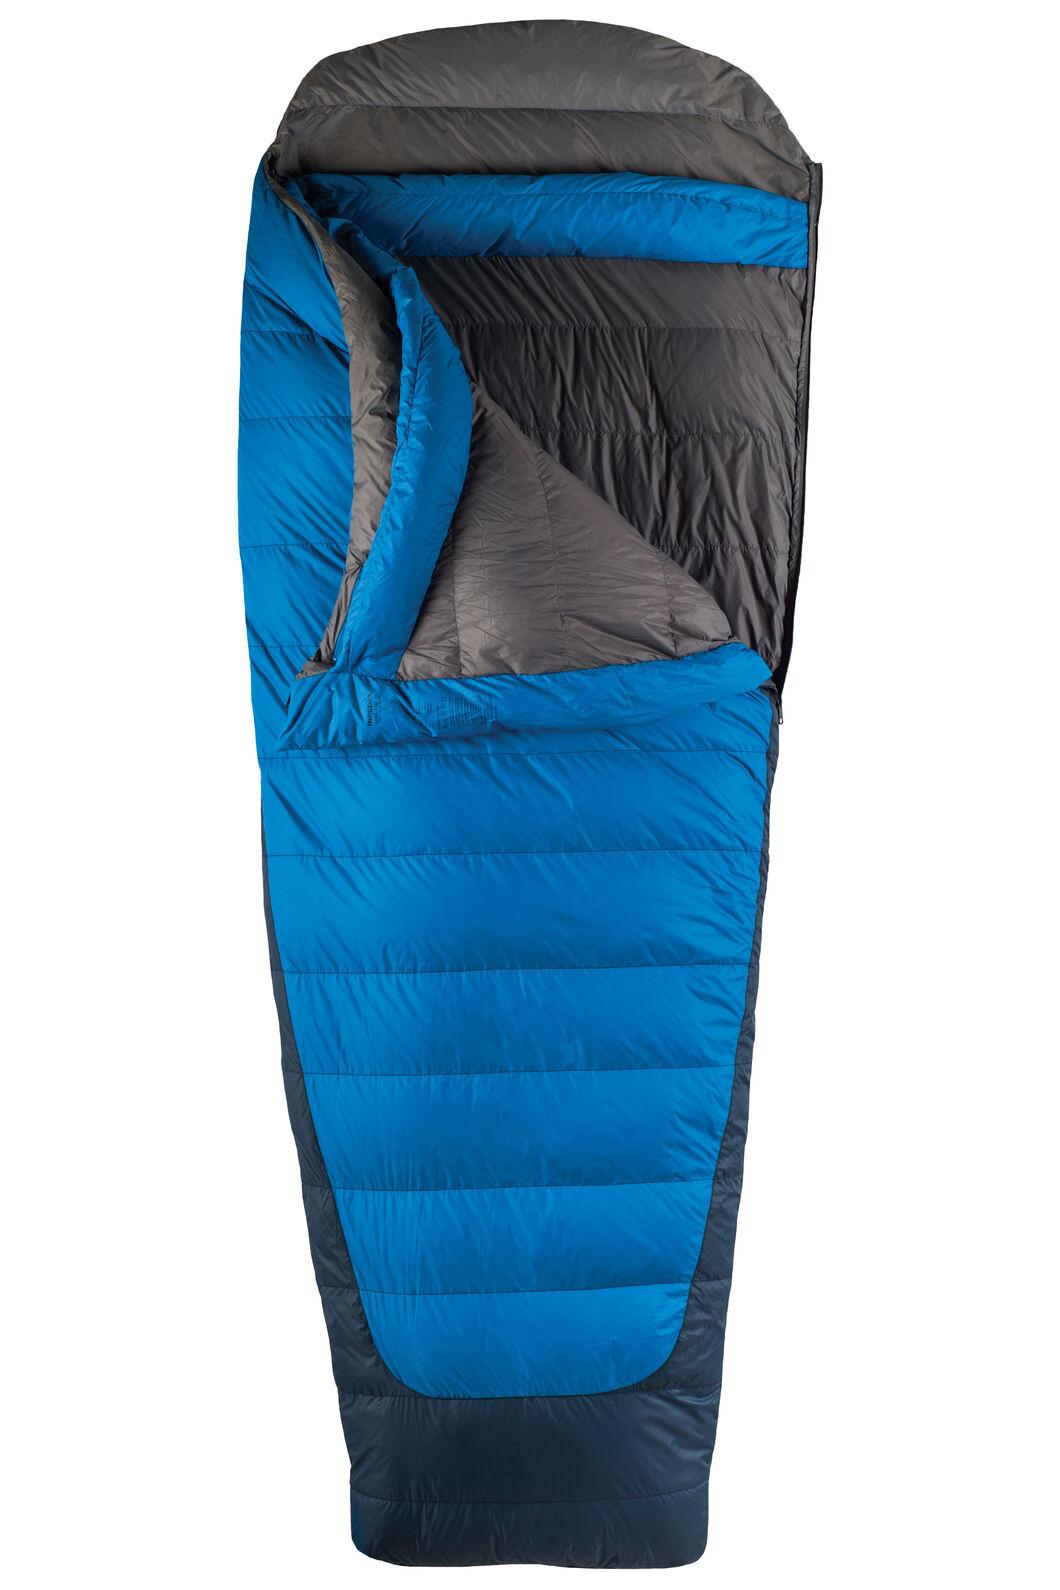 Macpac Escapade Down 500 Sleeping Bag - Extra Large, Classic Blue, hi-res